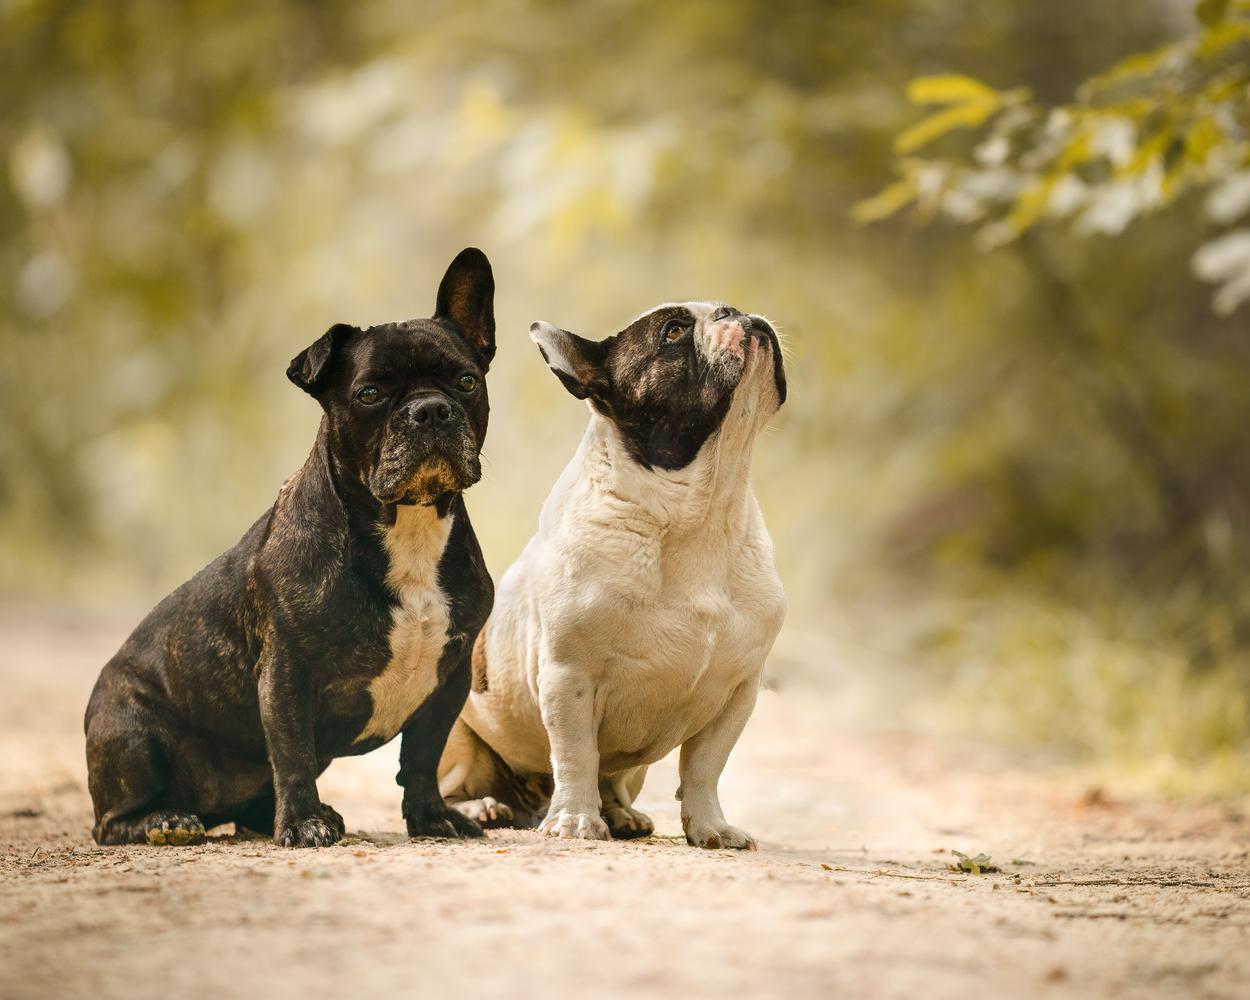 French Bulldog duo by Daniel van Duinkerken